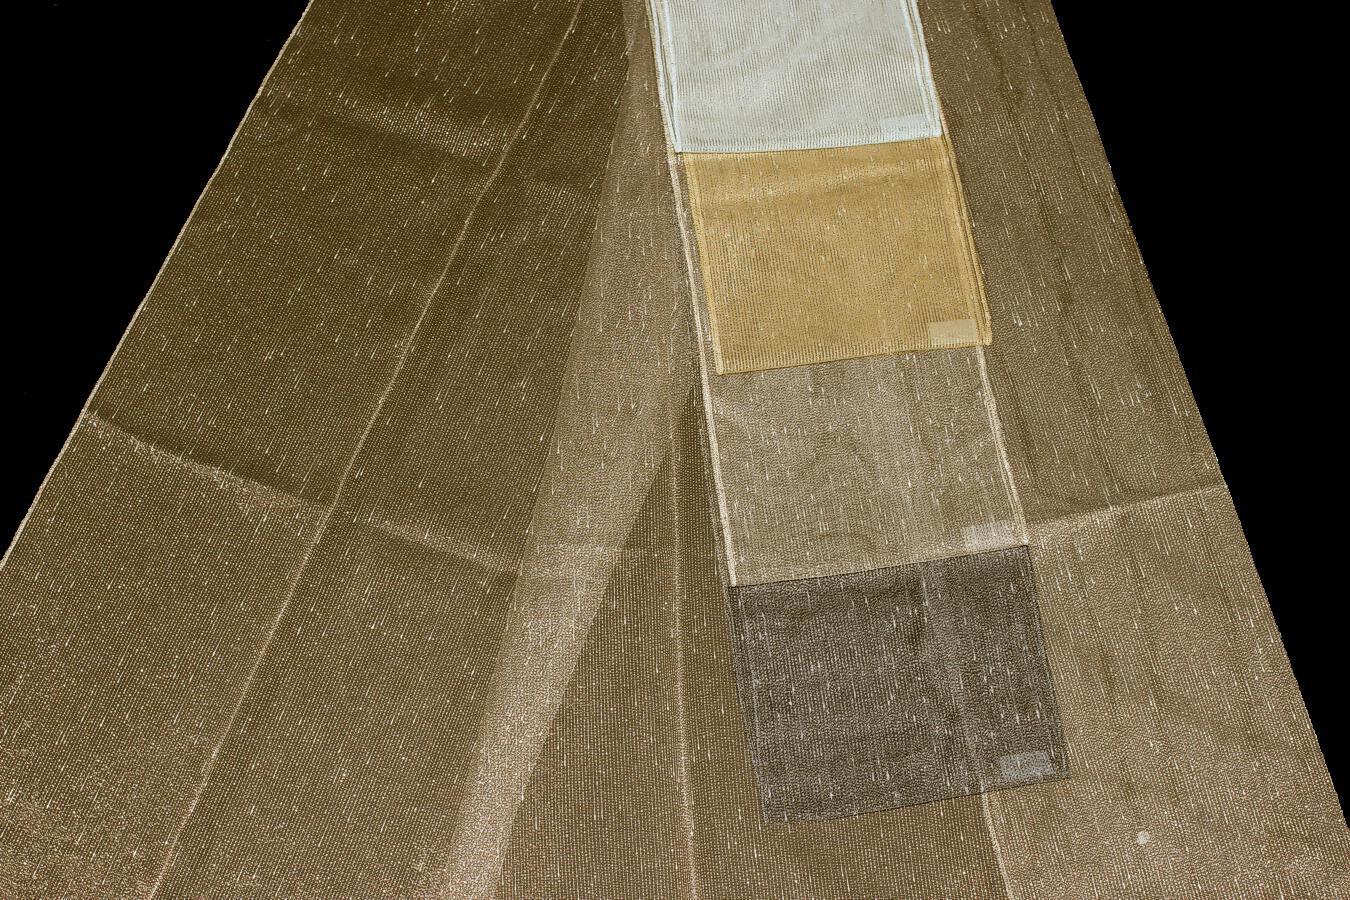 Záclona 924 300 cm s olůvkem 05 černá